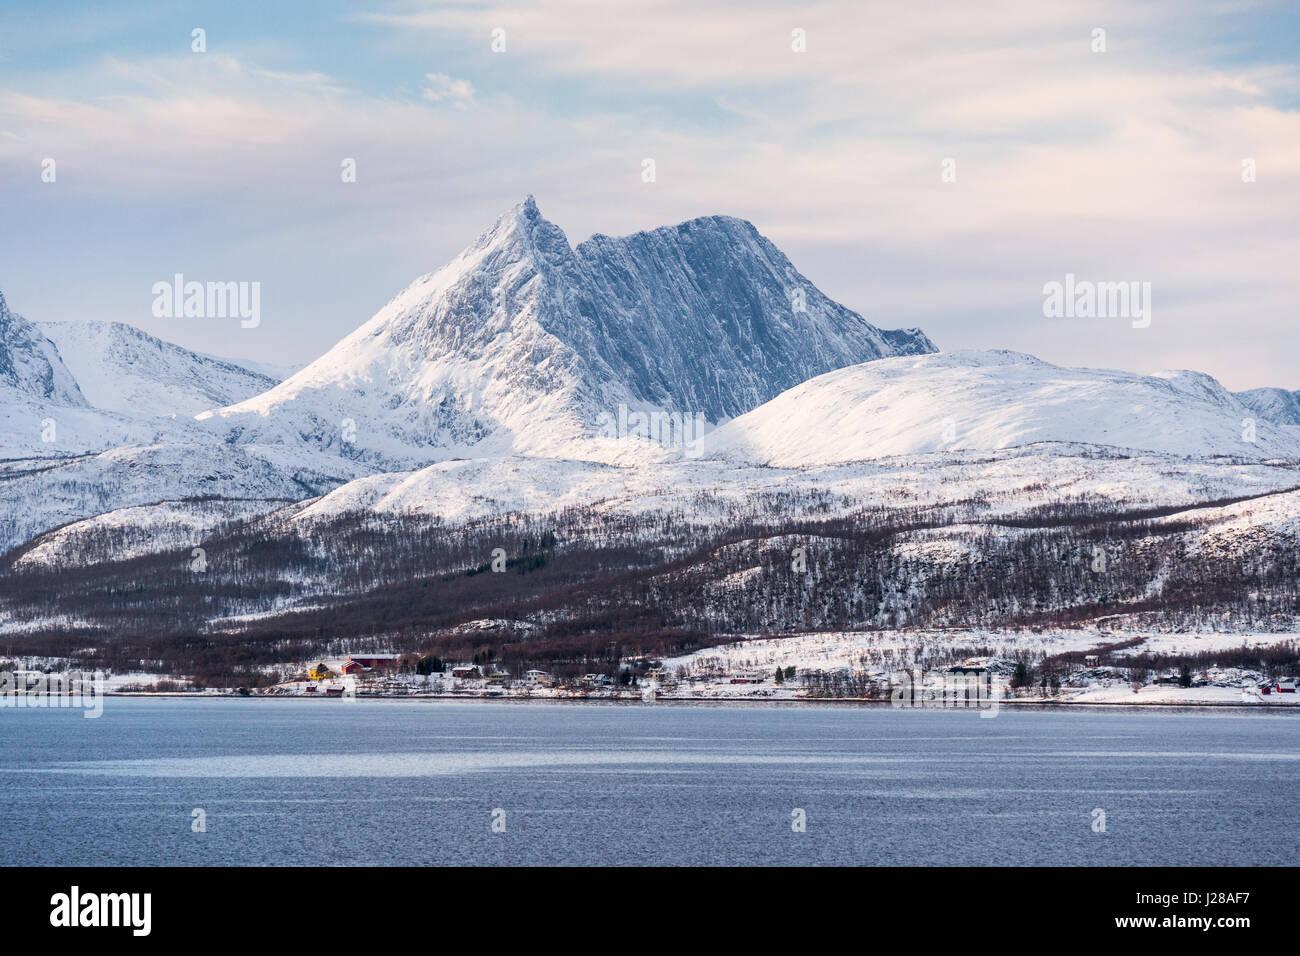 Distinctive mountain on the island of Senja, Troms County, northern Norway, seen from a Hurtigruten Coastal Express - Stock Image